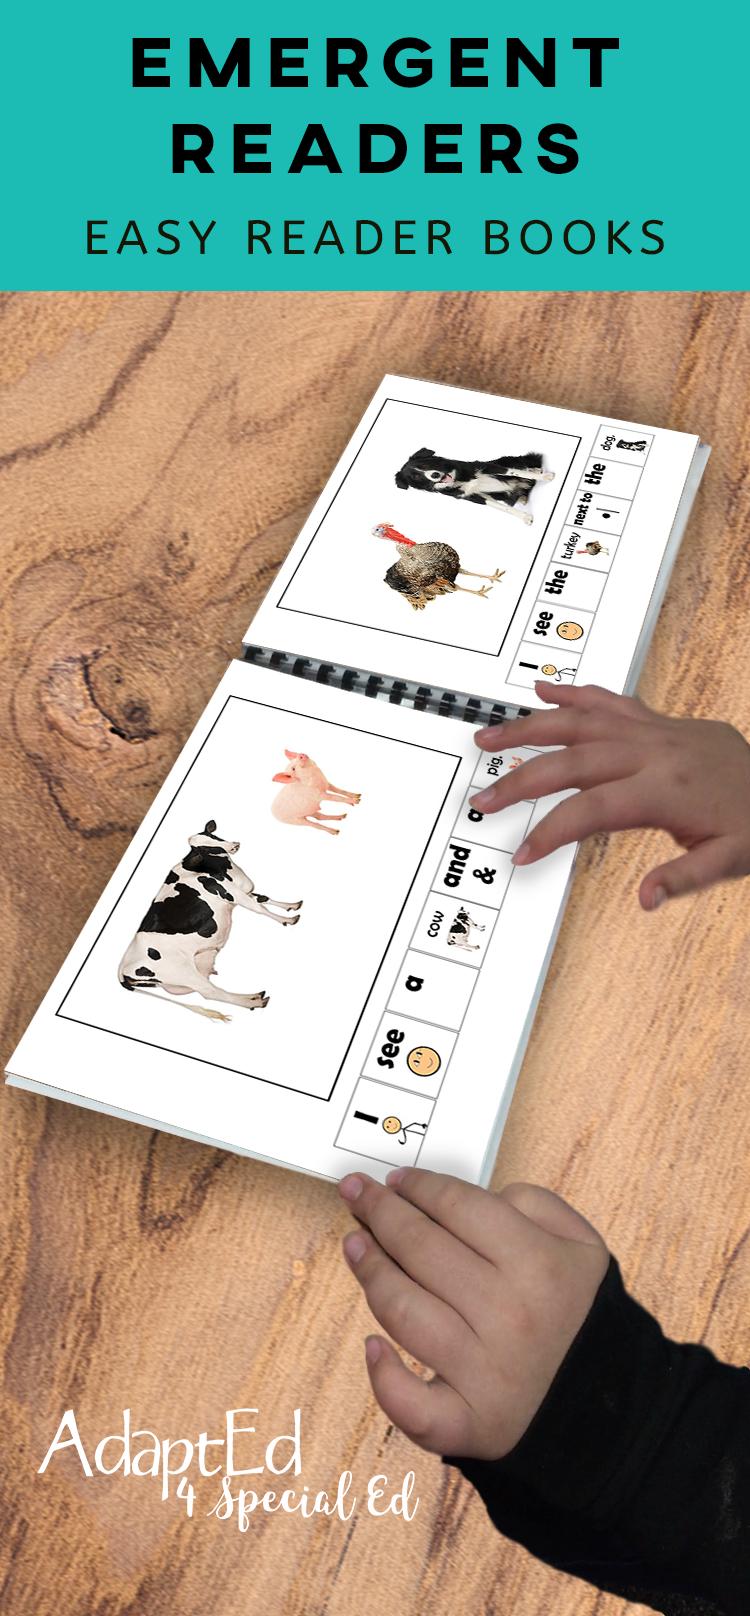 I See Animals 36 Book Set (Printable Pdf) Emergent Readers + - Free Adapted Books Printable